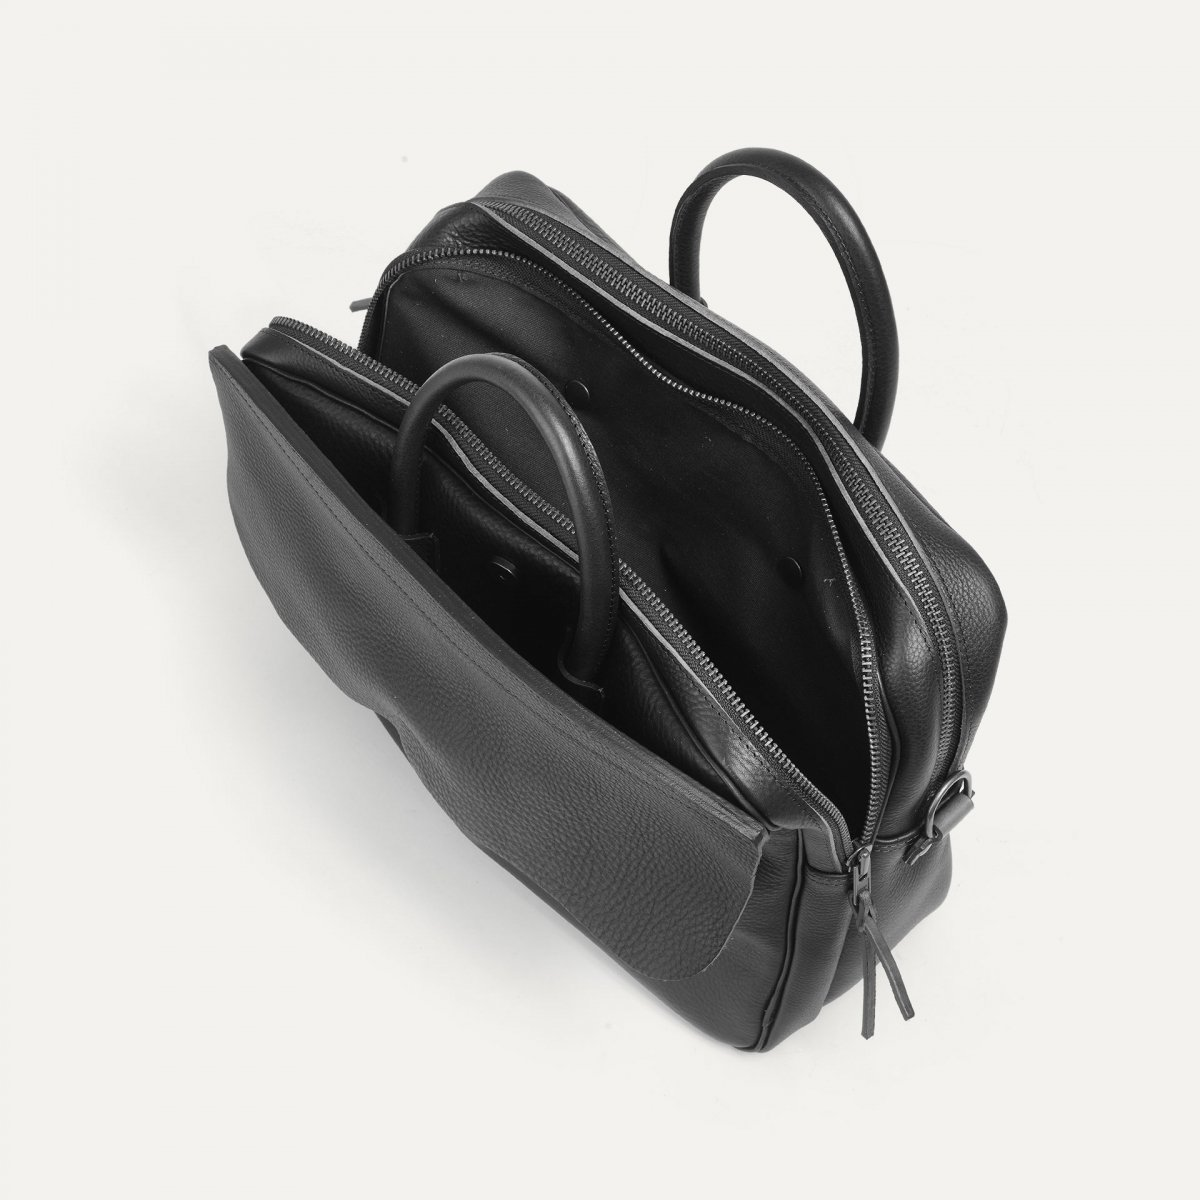 Zeppo Business bag - Dark Brown / E Pure (image n°5)